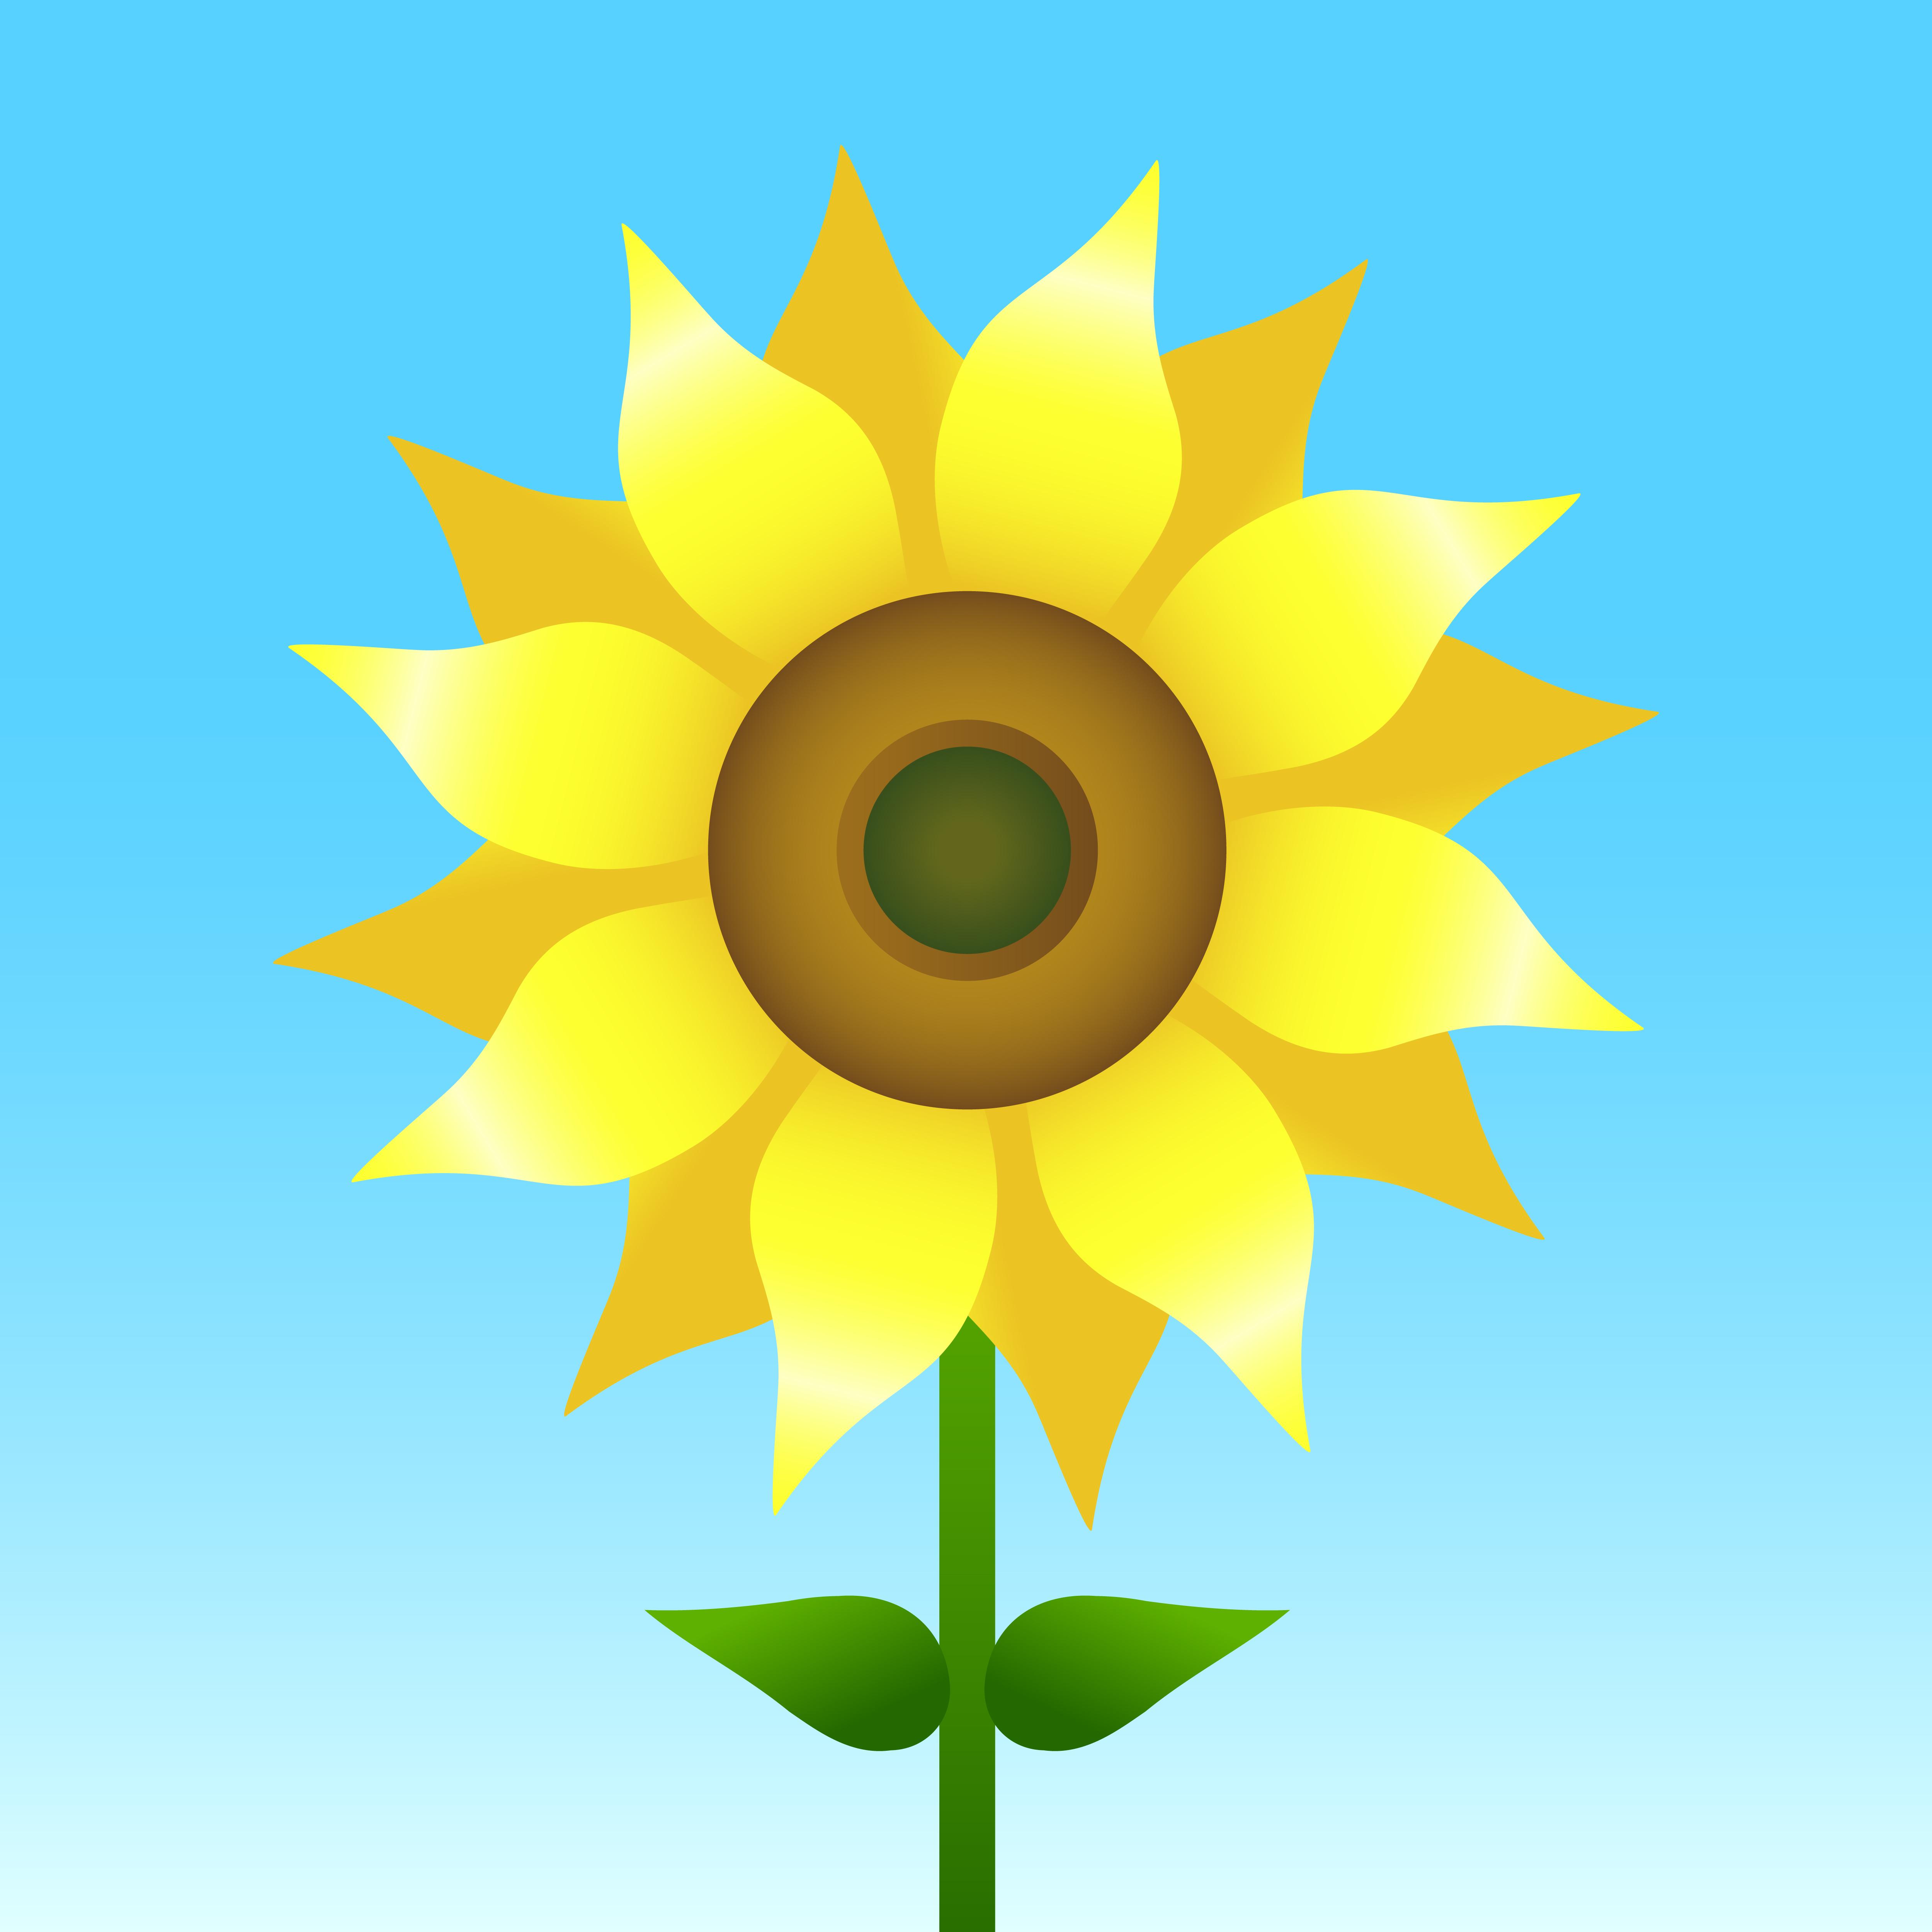 Sunflower vector illustration - Download Free Vectors ...